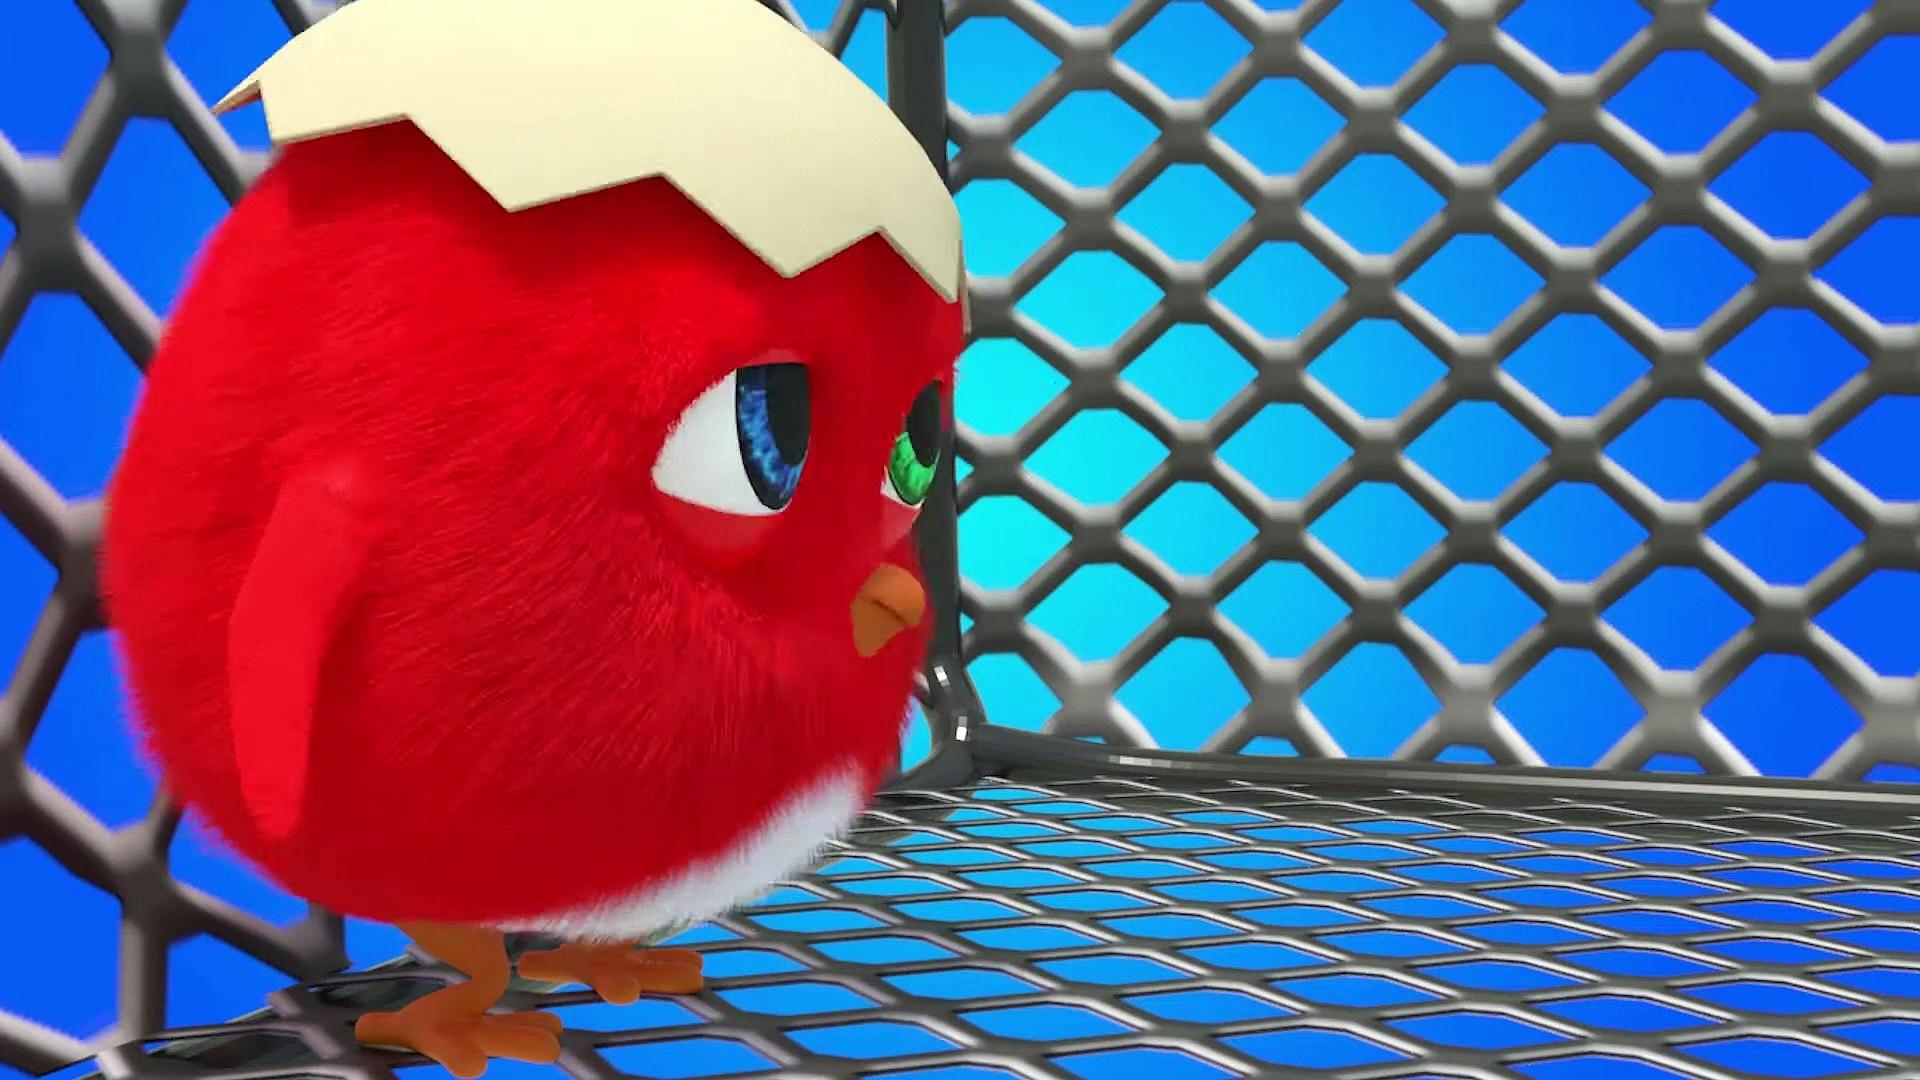 CucKoo Cartoon  Cuckoo Chicken 2020 - Part 11 Drôle de bande dessinée pour les enfants 2020